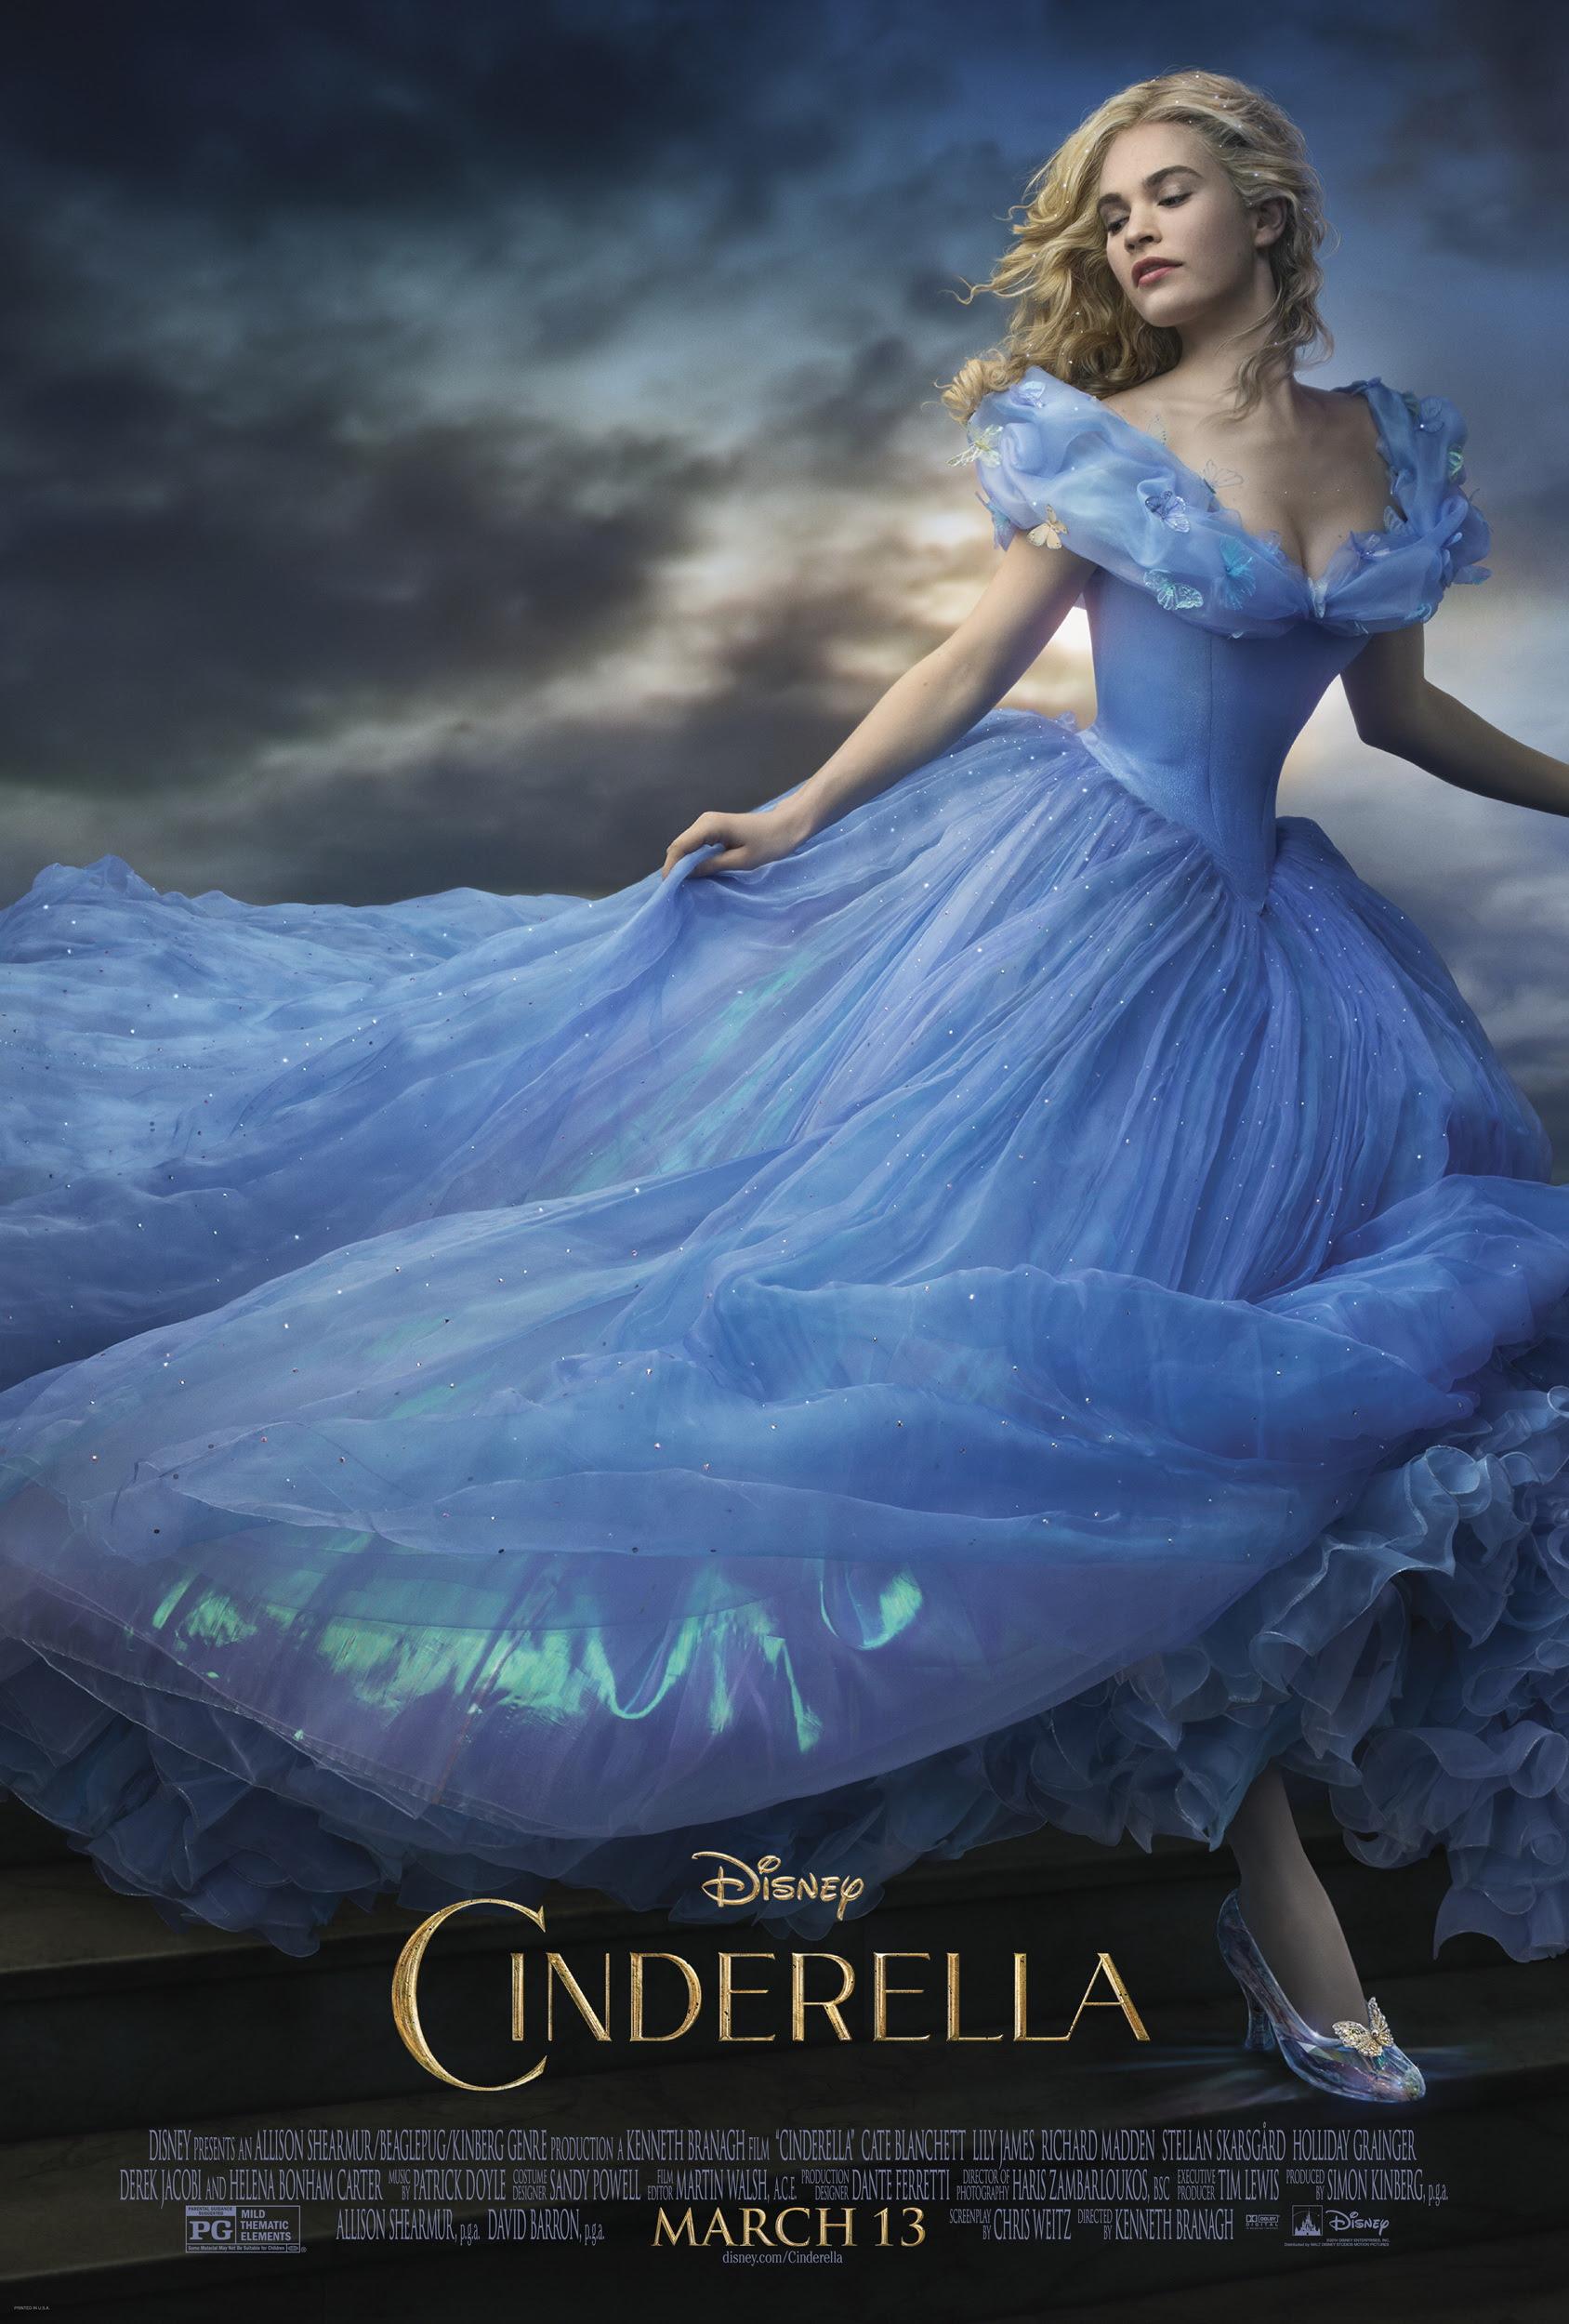 http://vignette2.wikia.nocookie.net/disney/images/b/b4/Cinderella_2015_1.jpg/revision/latest?cb=20141119151633